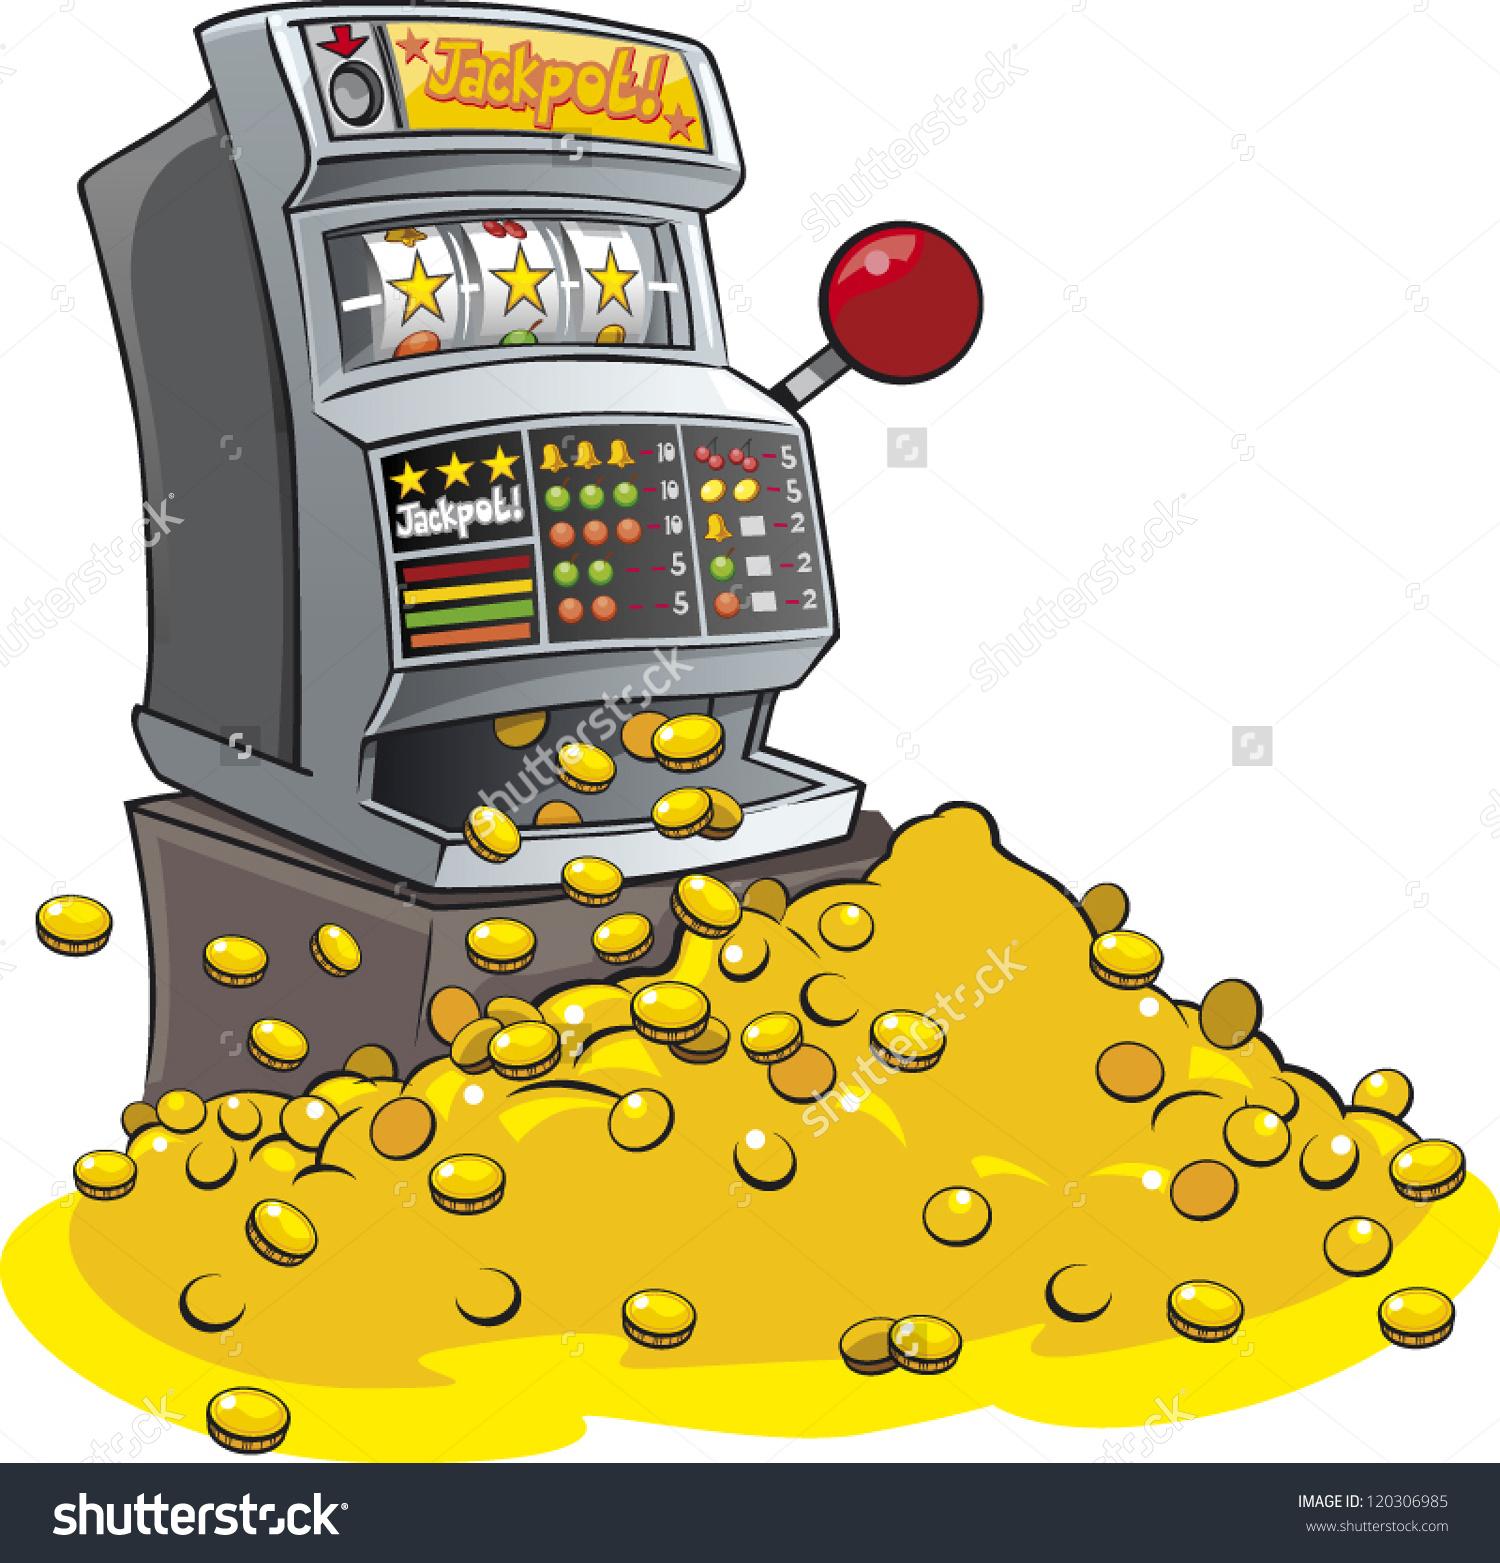 Cartoon One Arm Bandit Fruit Machine Stock Vector 120306985.